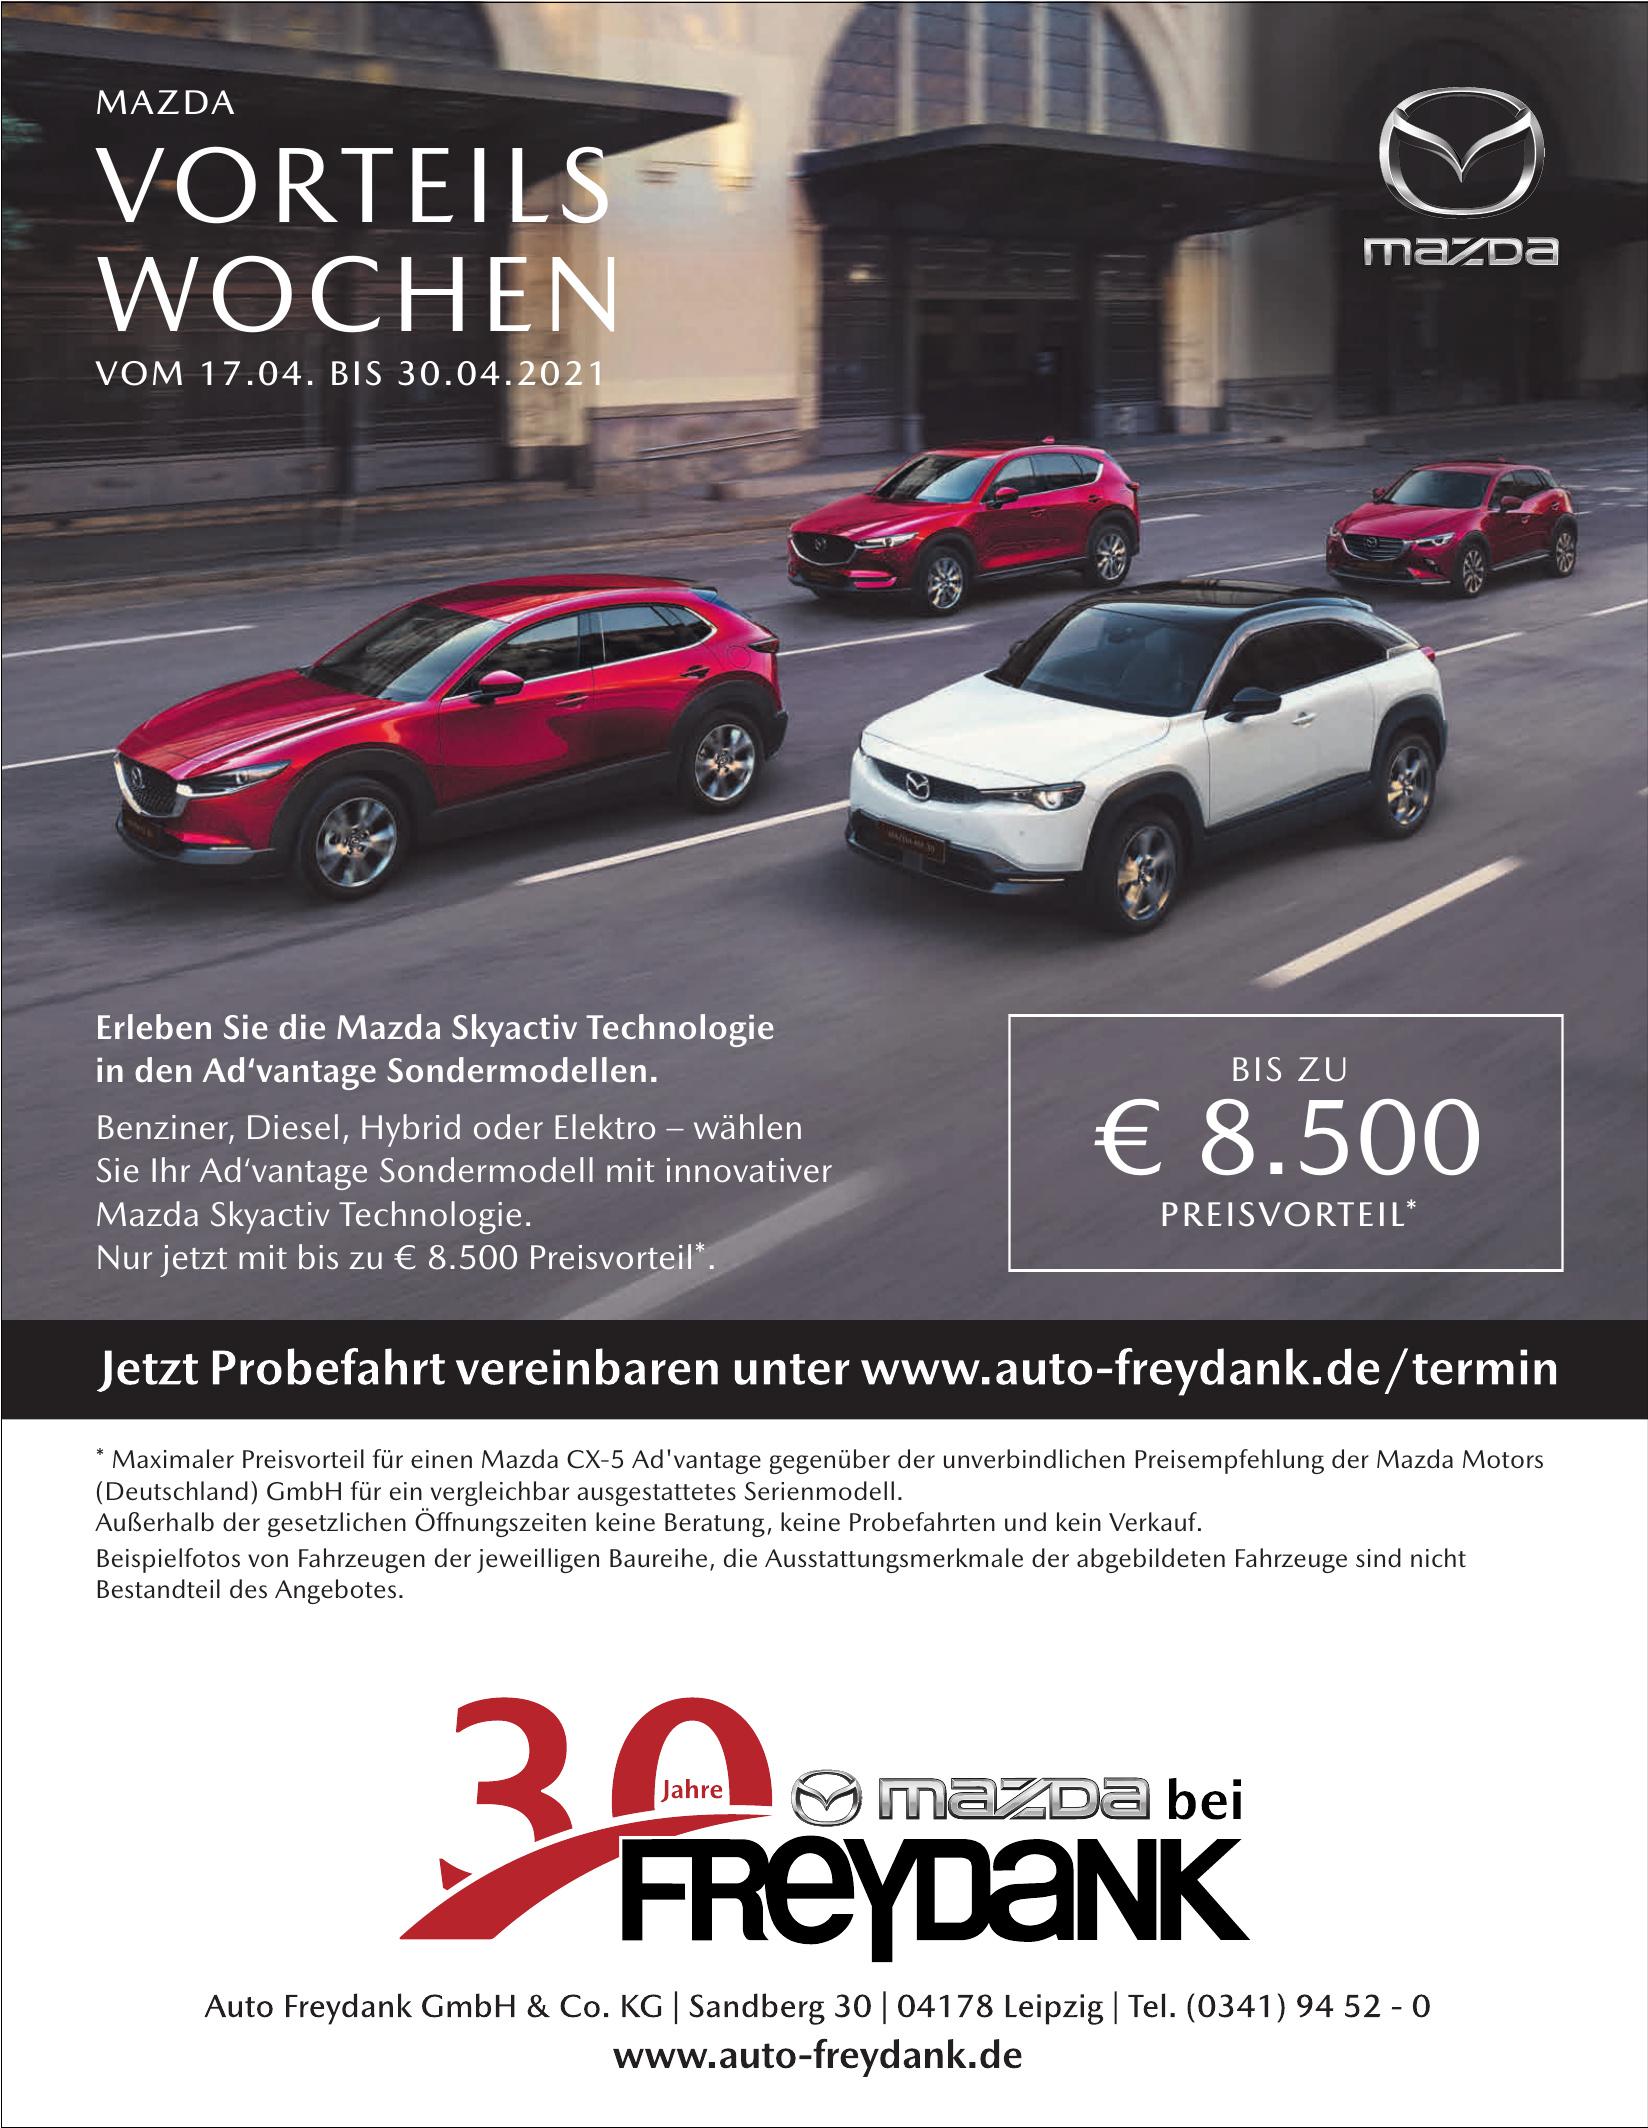 Auto Freydank GmbH & Co. KG